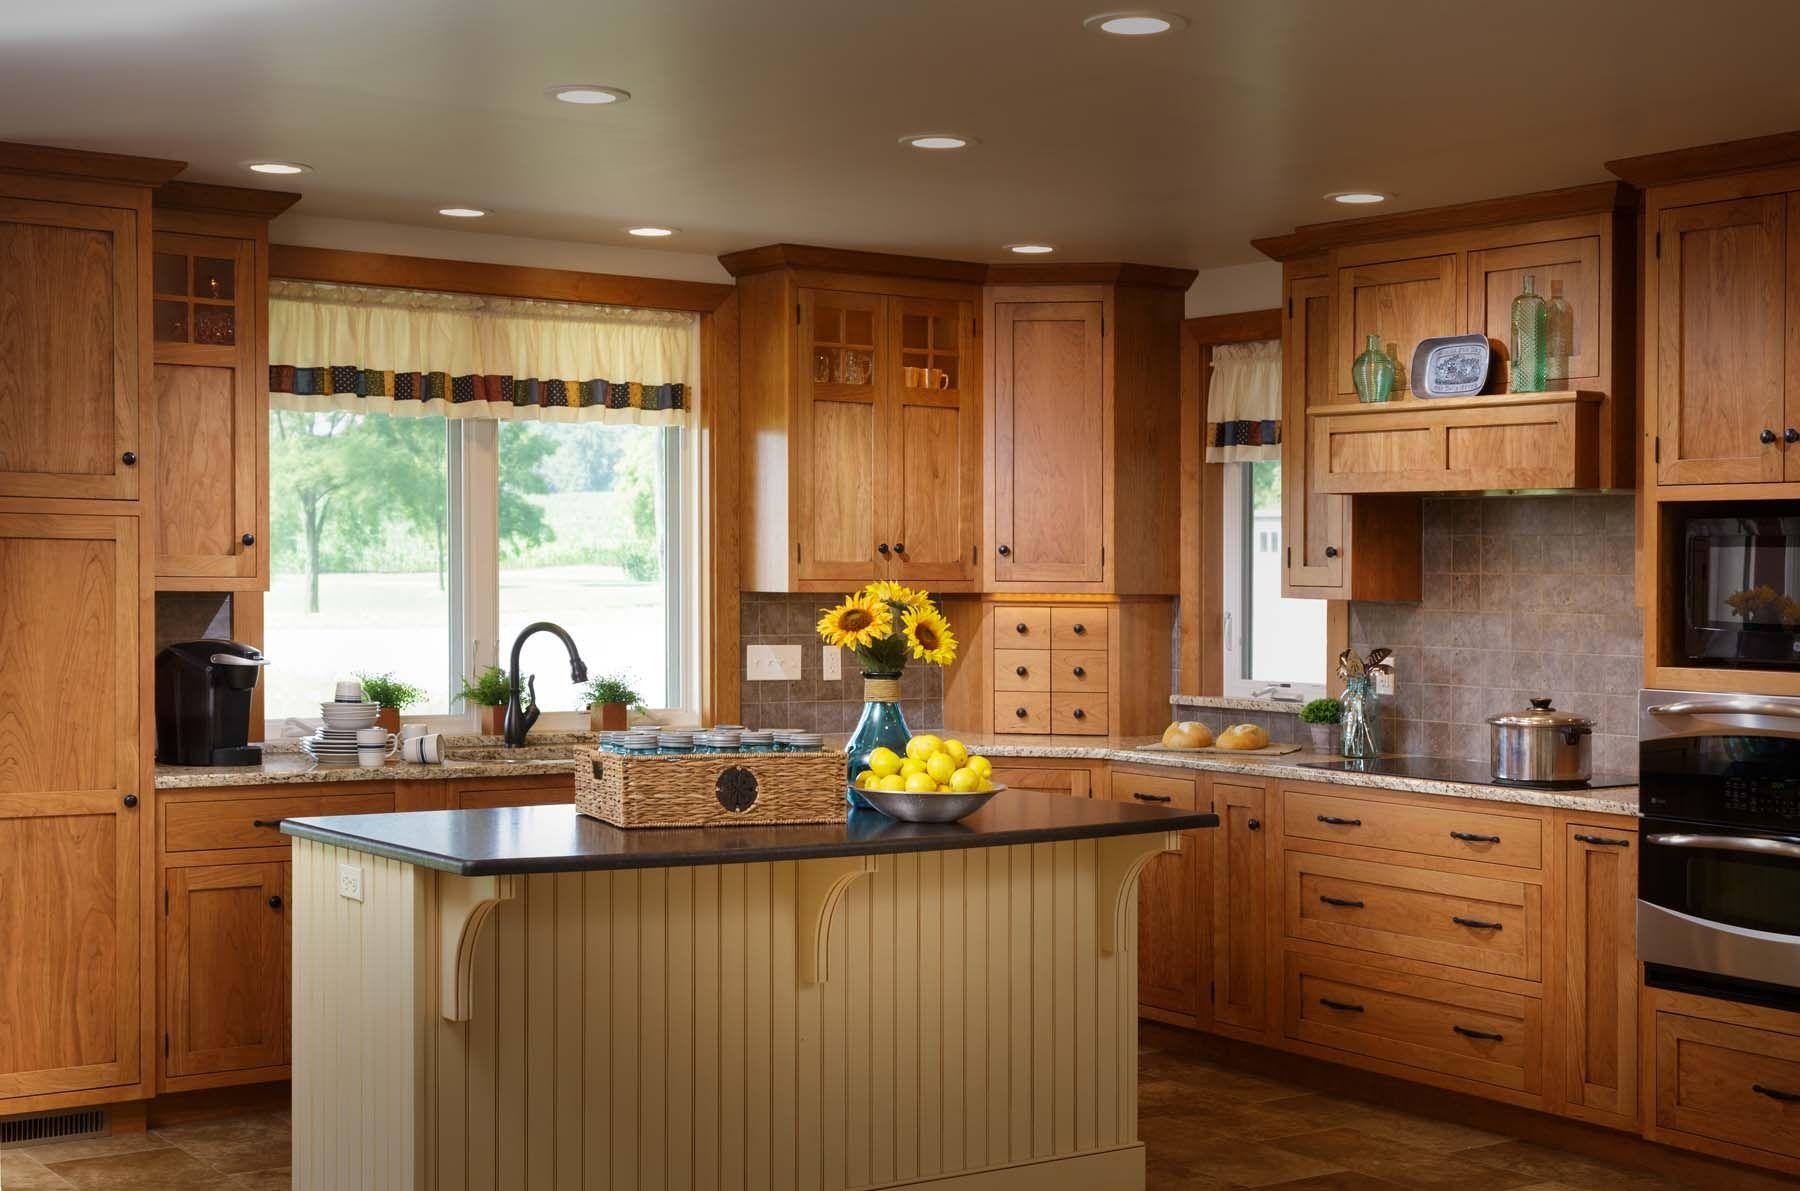 Kitchen: Shaker Cherry Cabinets, U0027burntu0027 Granite (black, But Looks More  Like Soapstone), Natural Slate (color Mixed) | Cleburne | Pinterest | Cherry  ...